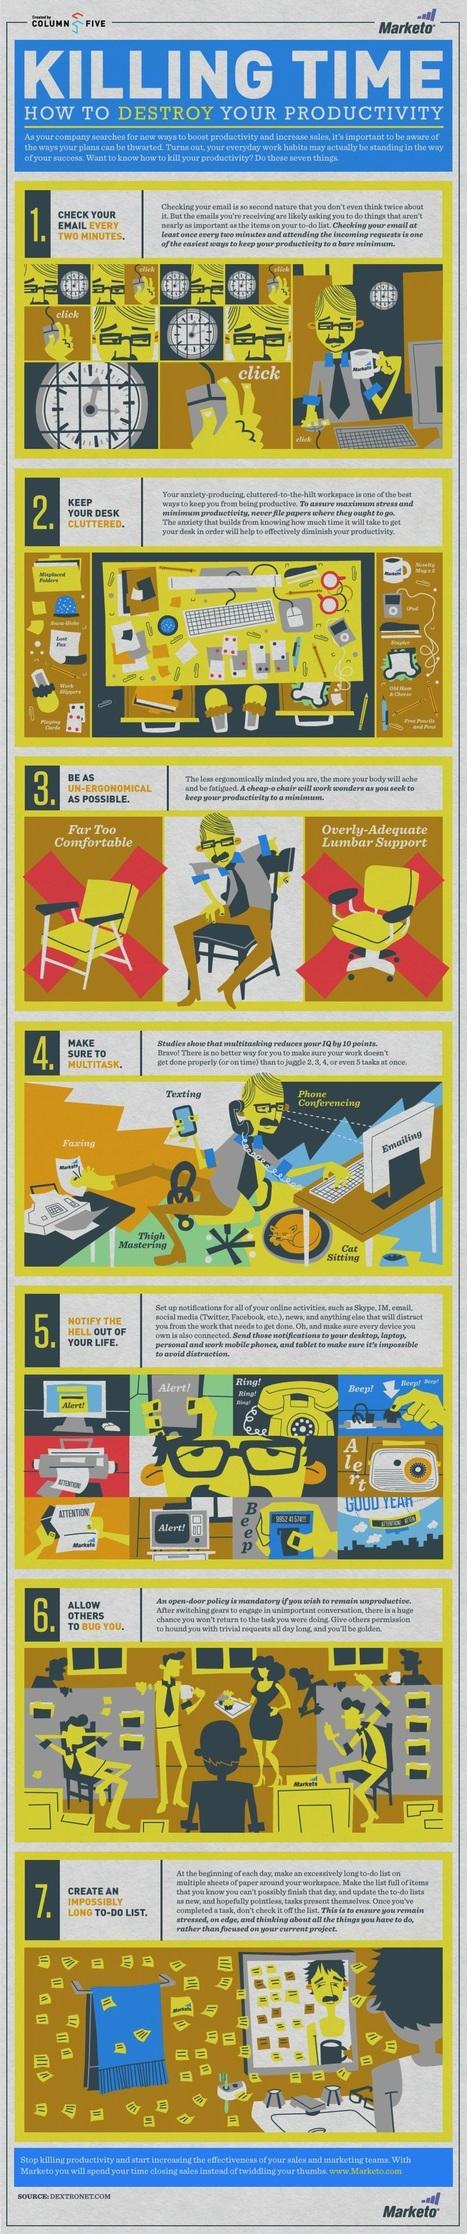 7 Ways to Destroy Productivity - Lifehack | Leadership Training | Scoop.it